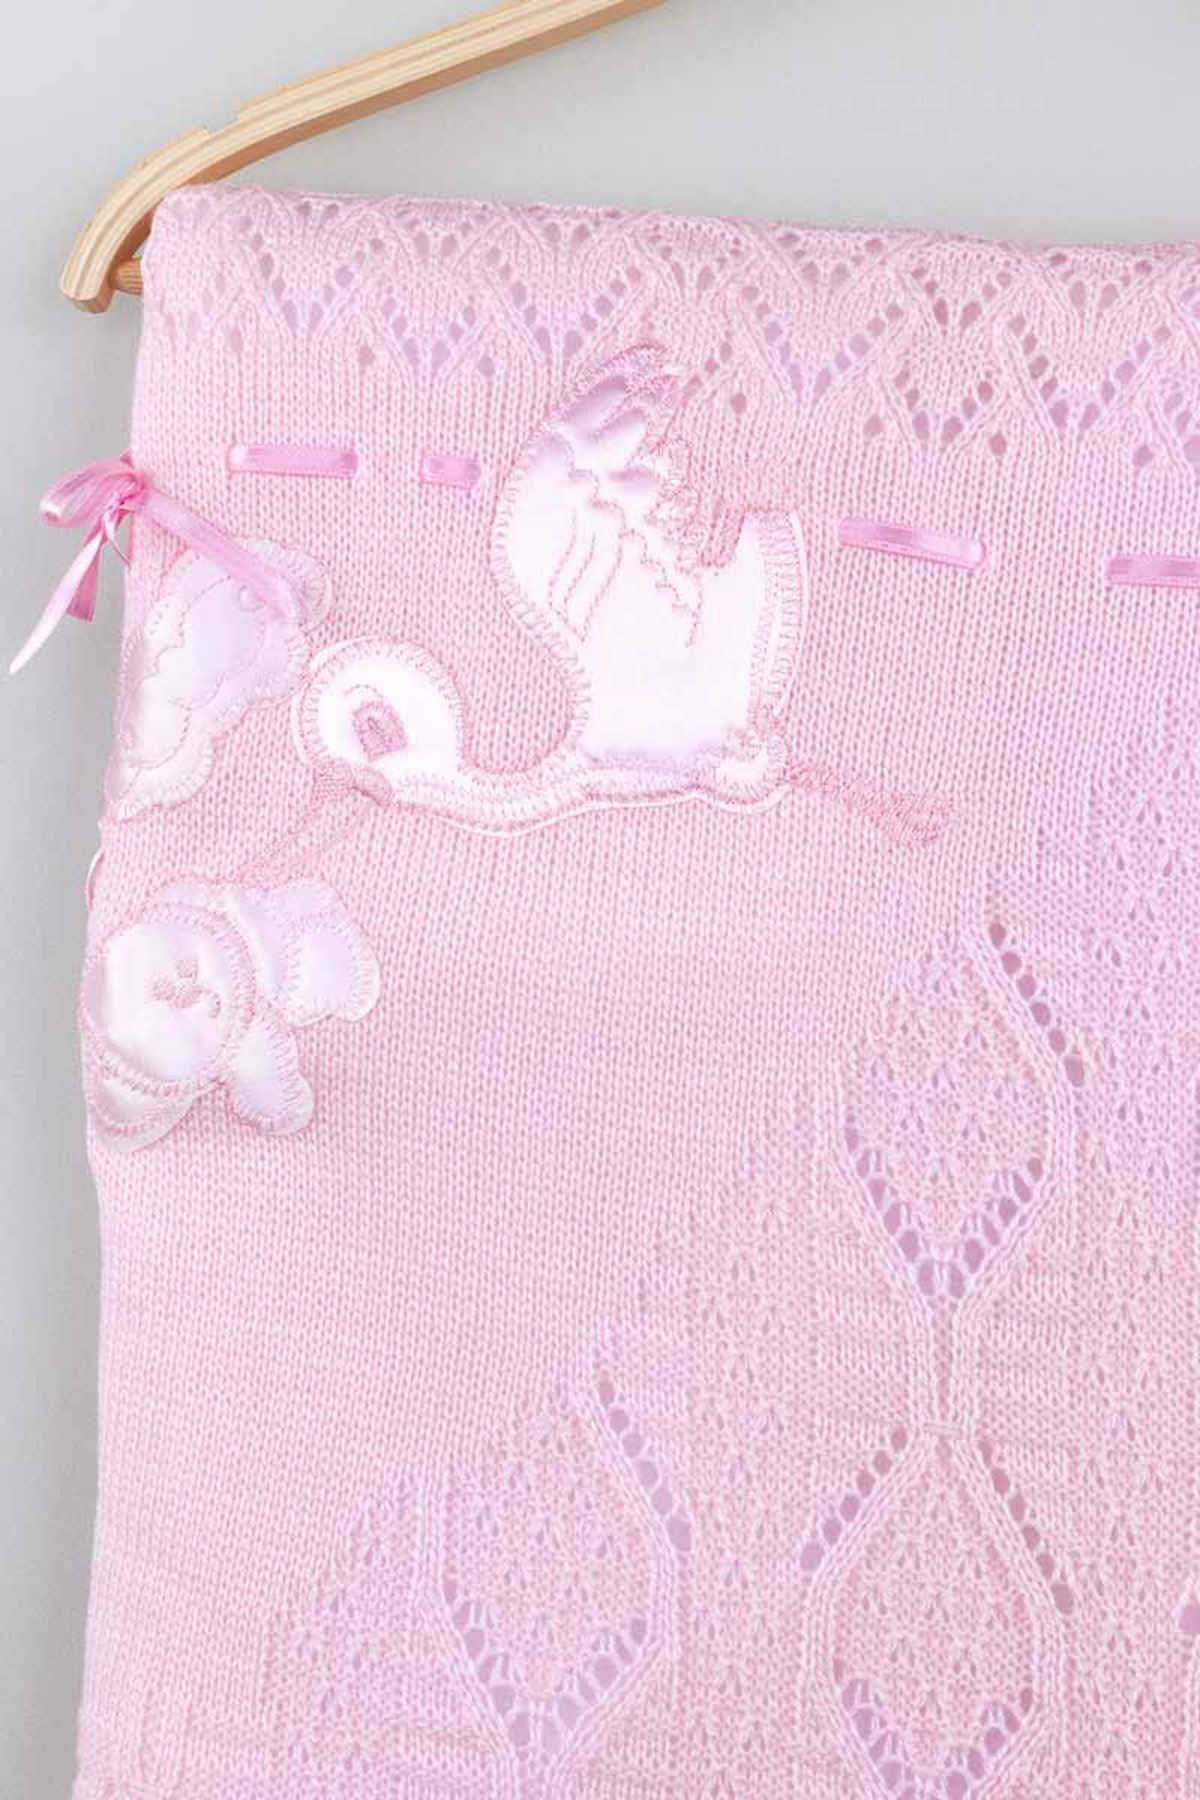 Pembe Triko Örme 80x80 cm Kız  Bebek Battaniye